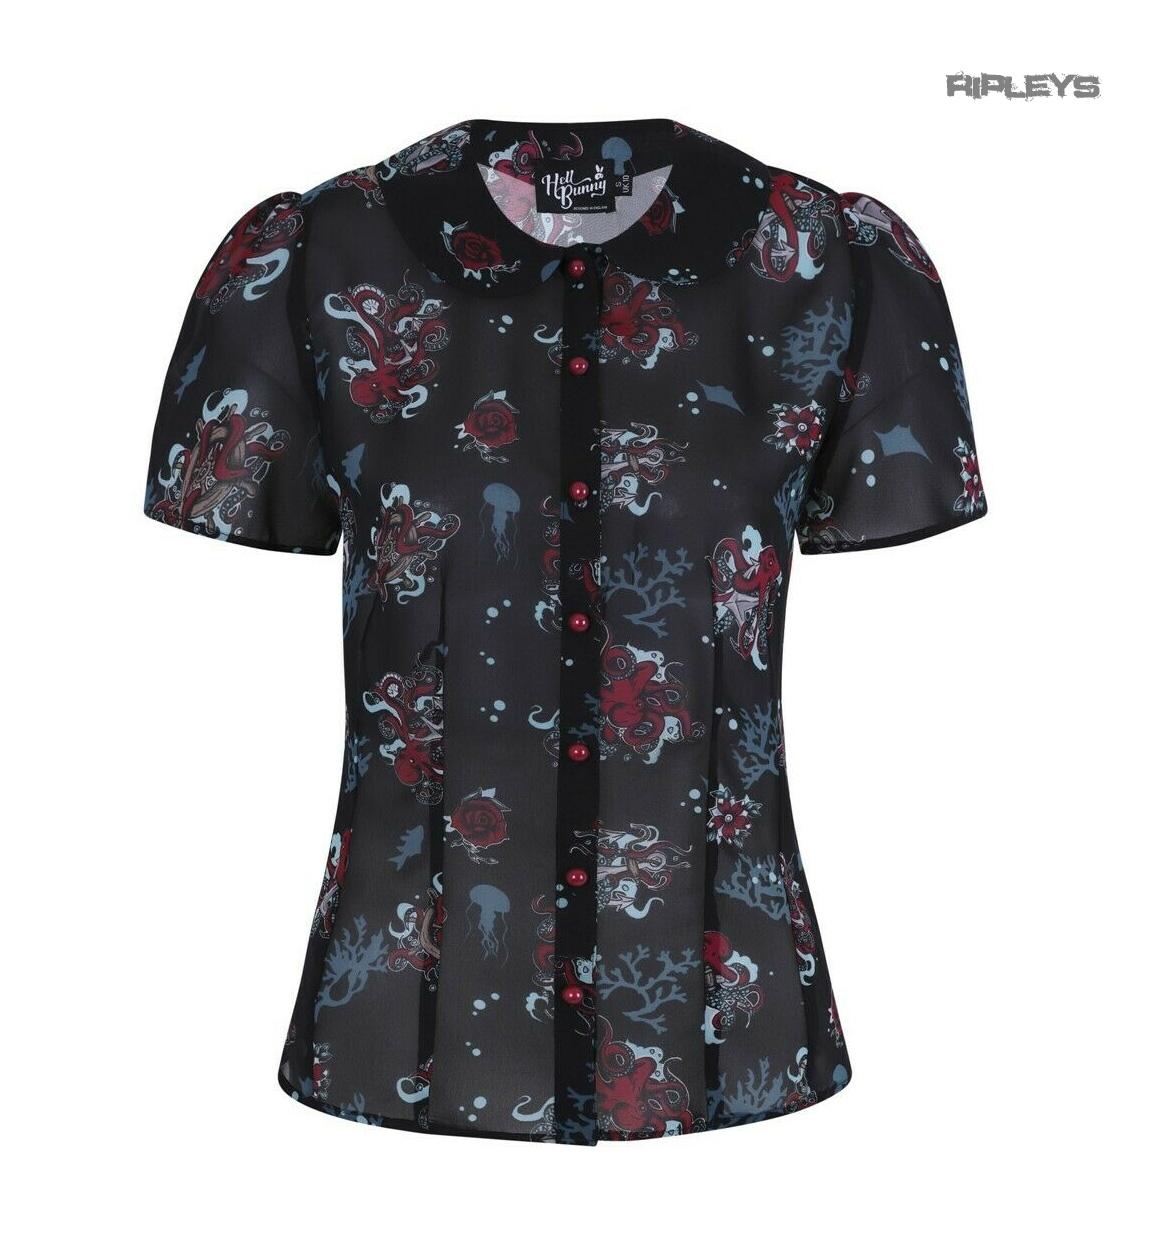 Hell-Bunny-50s-Shirt-Top-Black-Ocean-Octopus-Roses-POSEIDON-Blouse-All-Sizes thumbnail 34